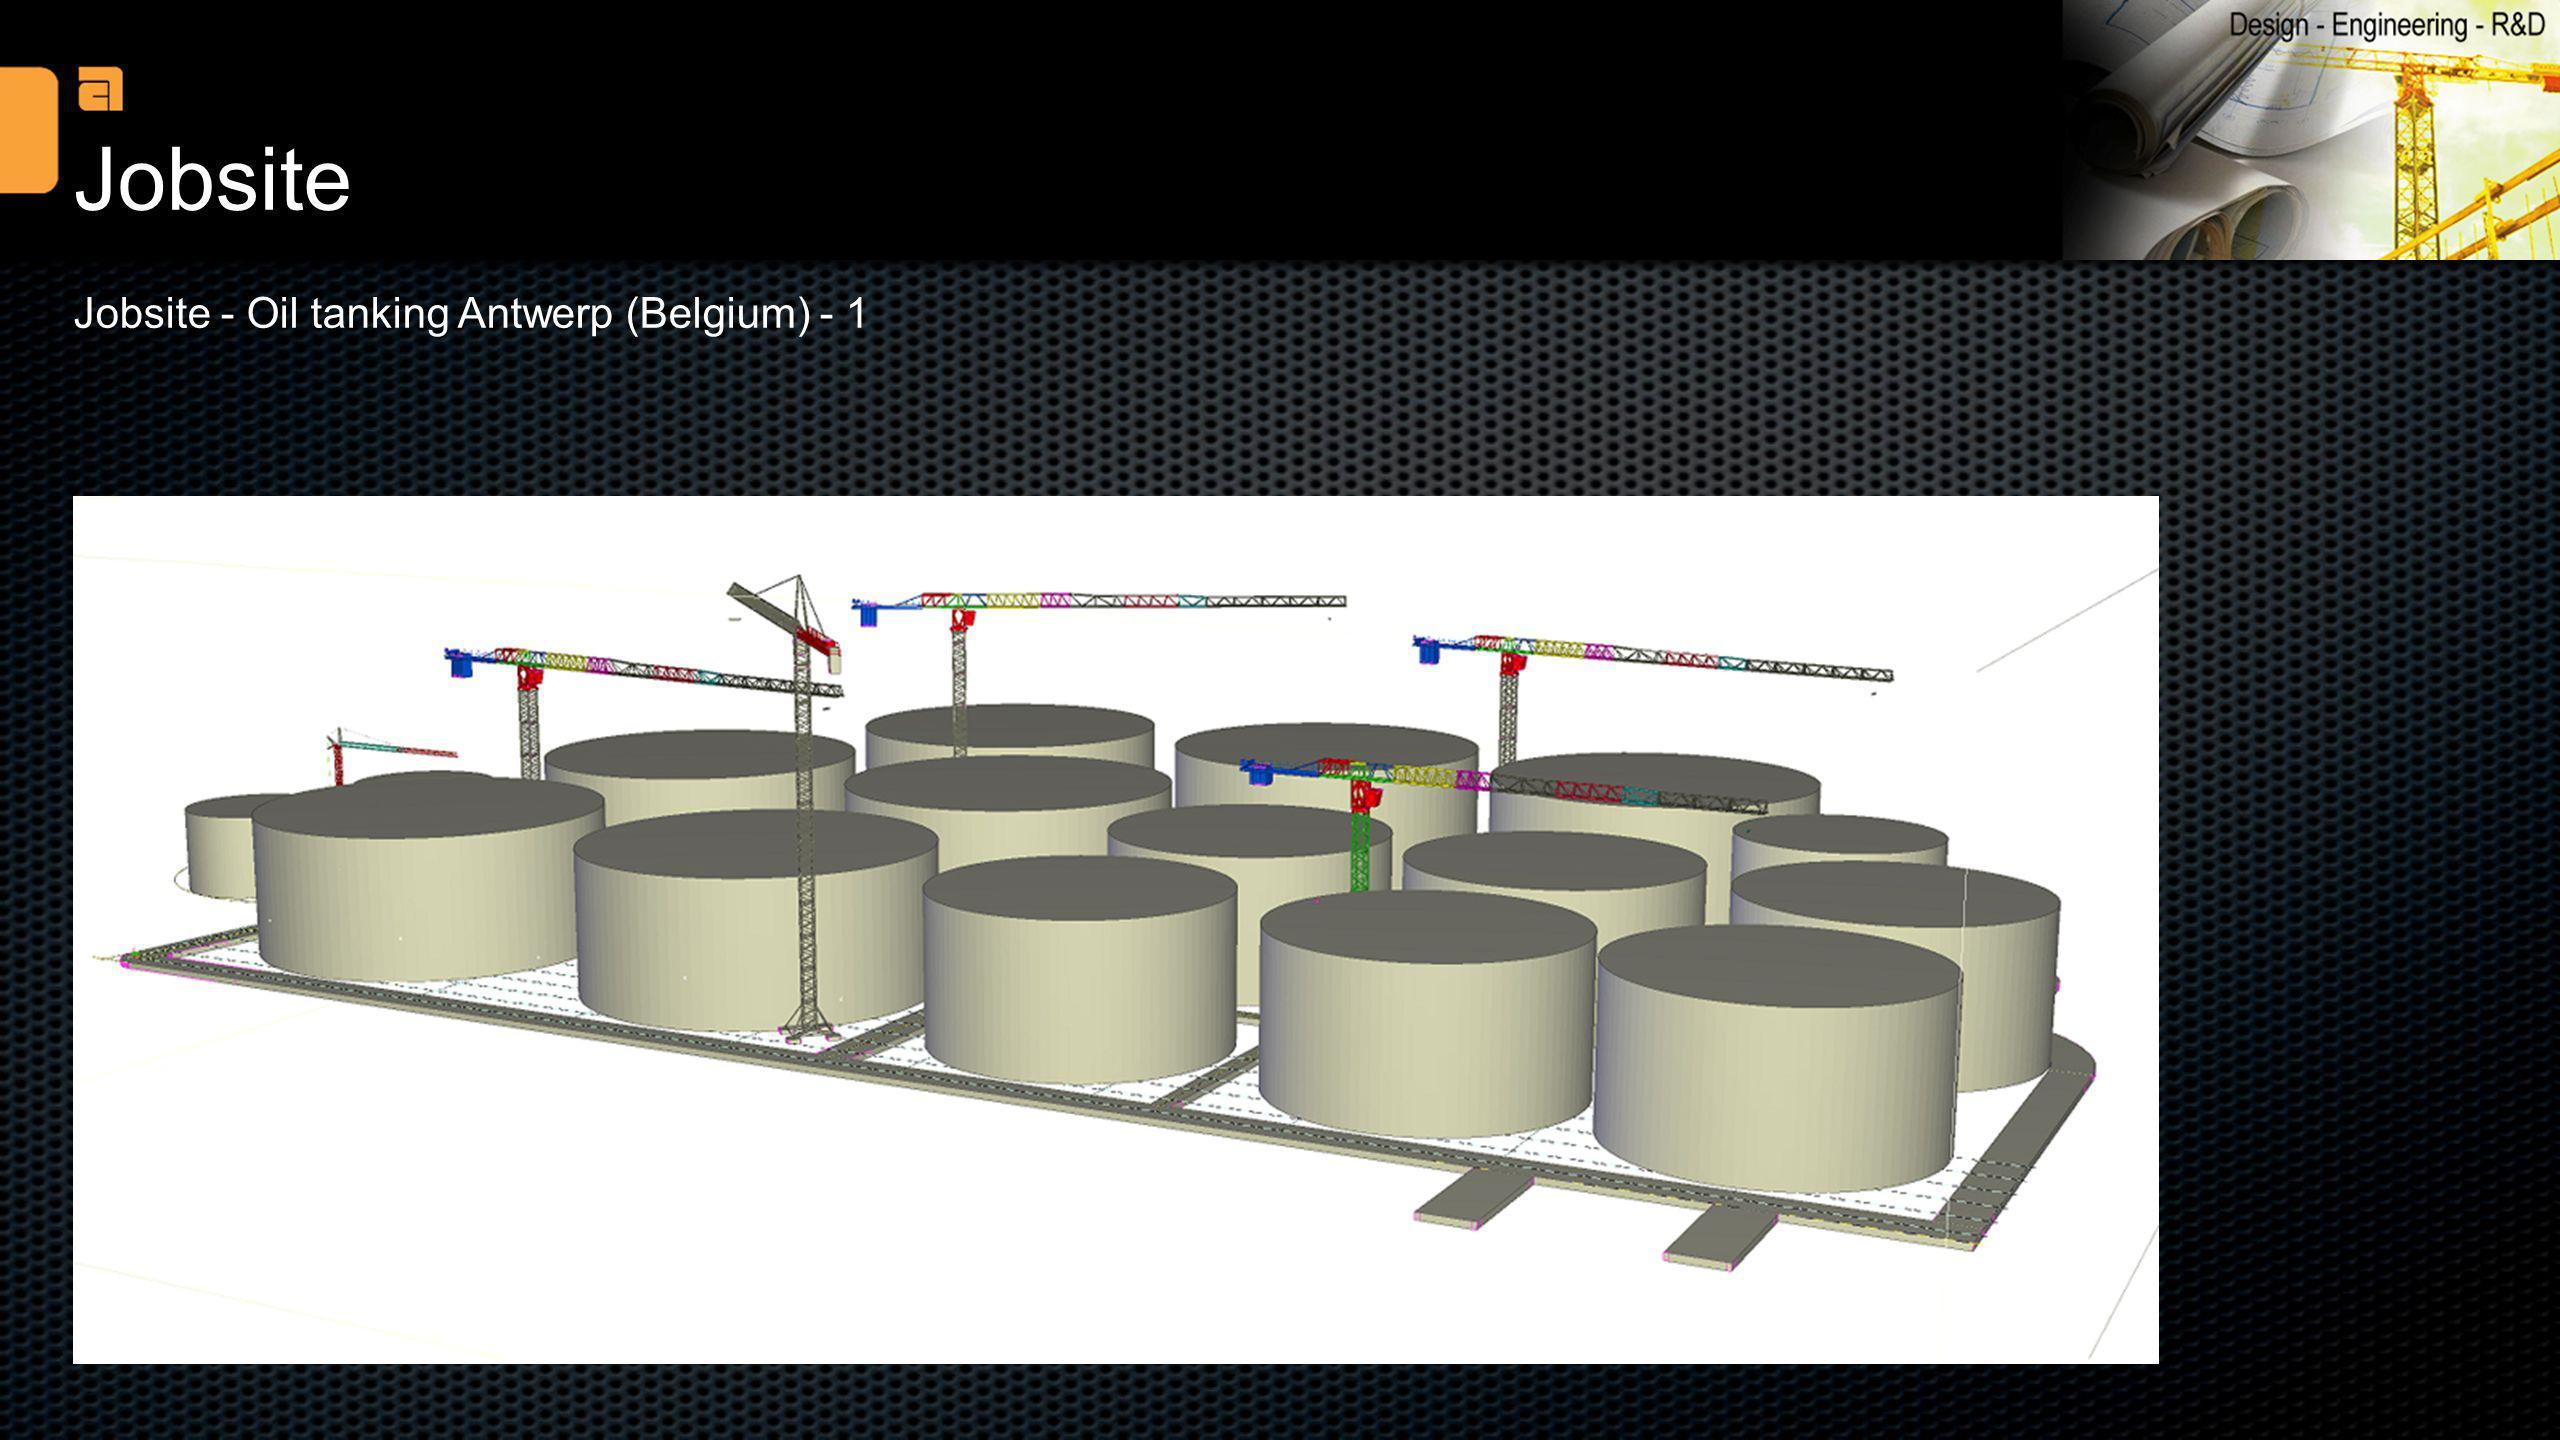 Jobsite Jobsite - Oil tanking Antwerp (Belgium) - 1